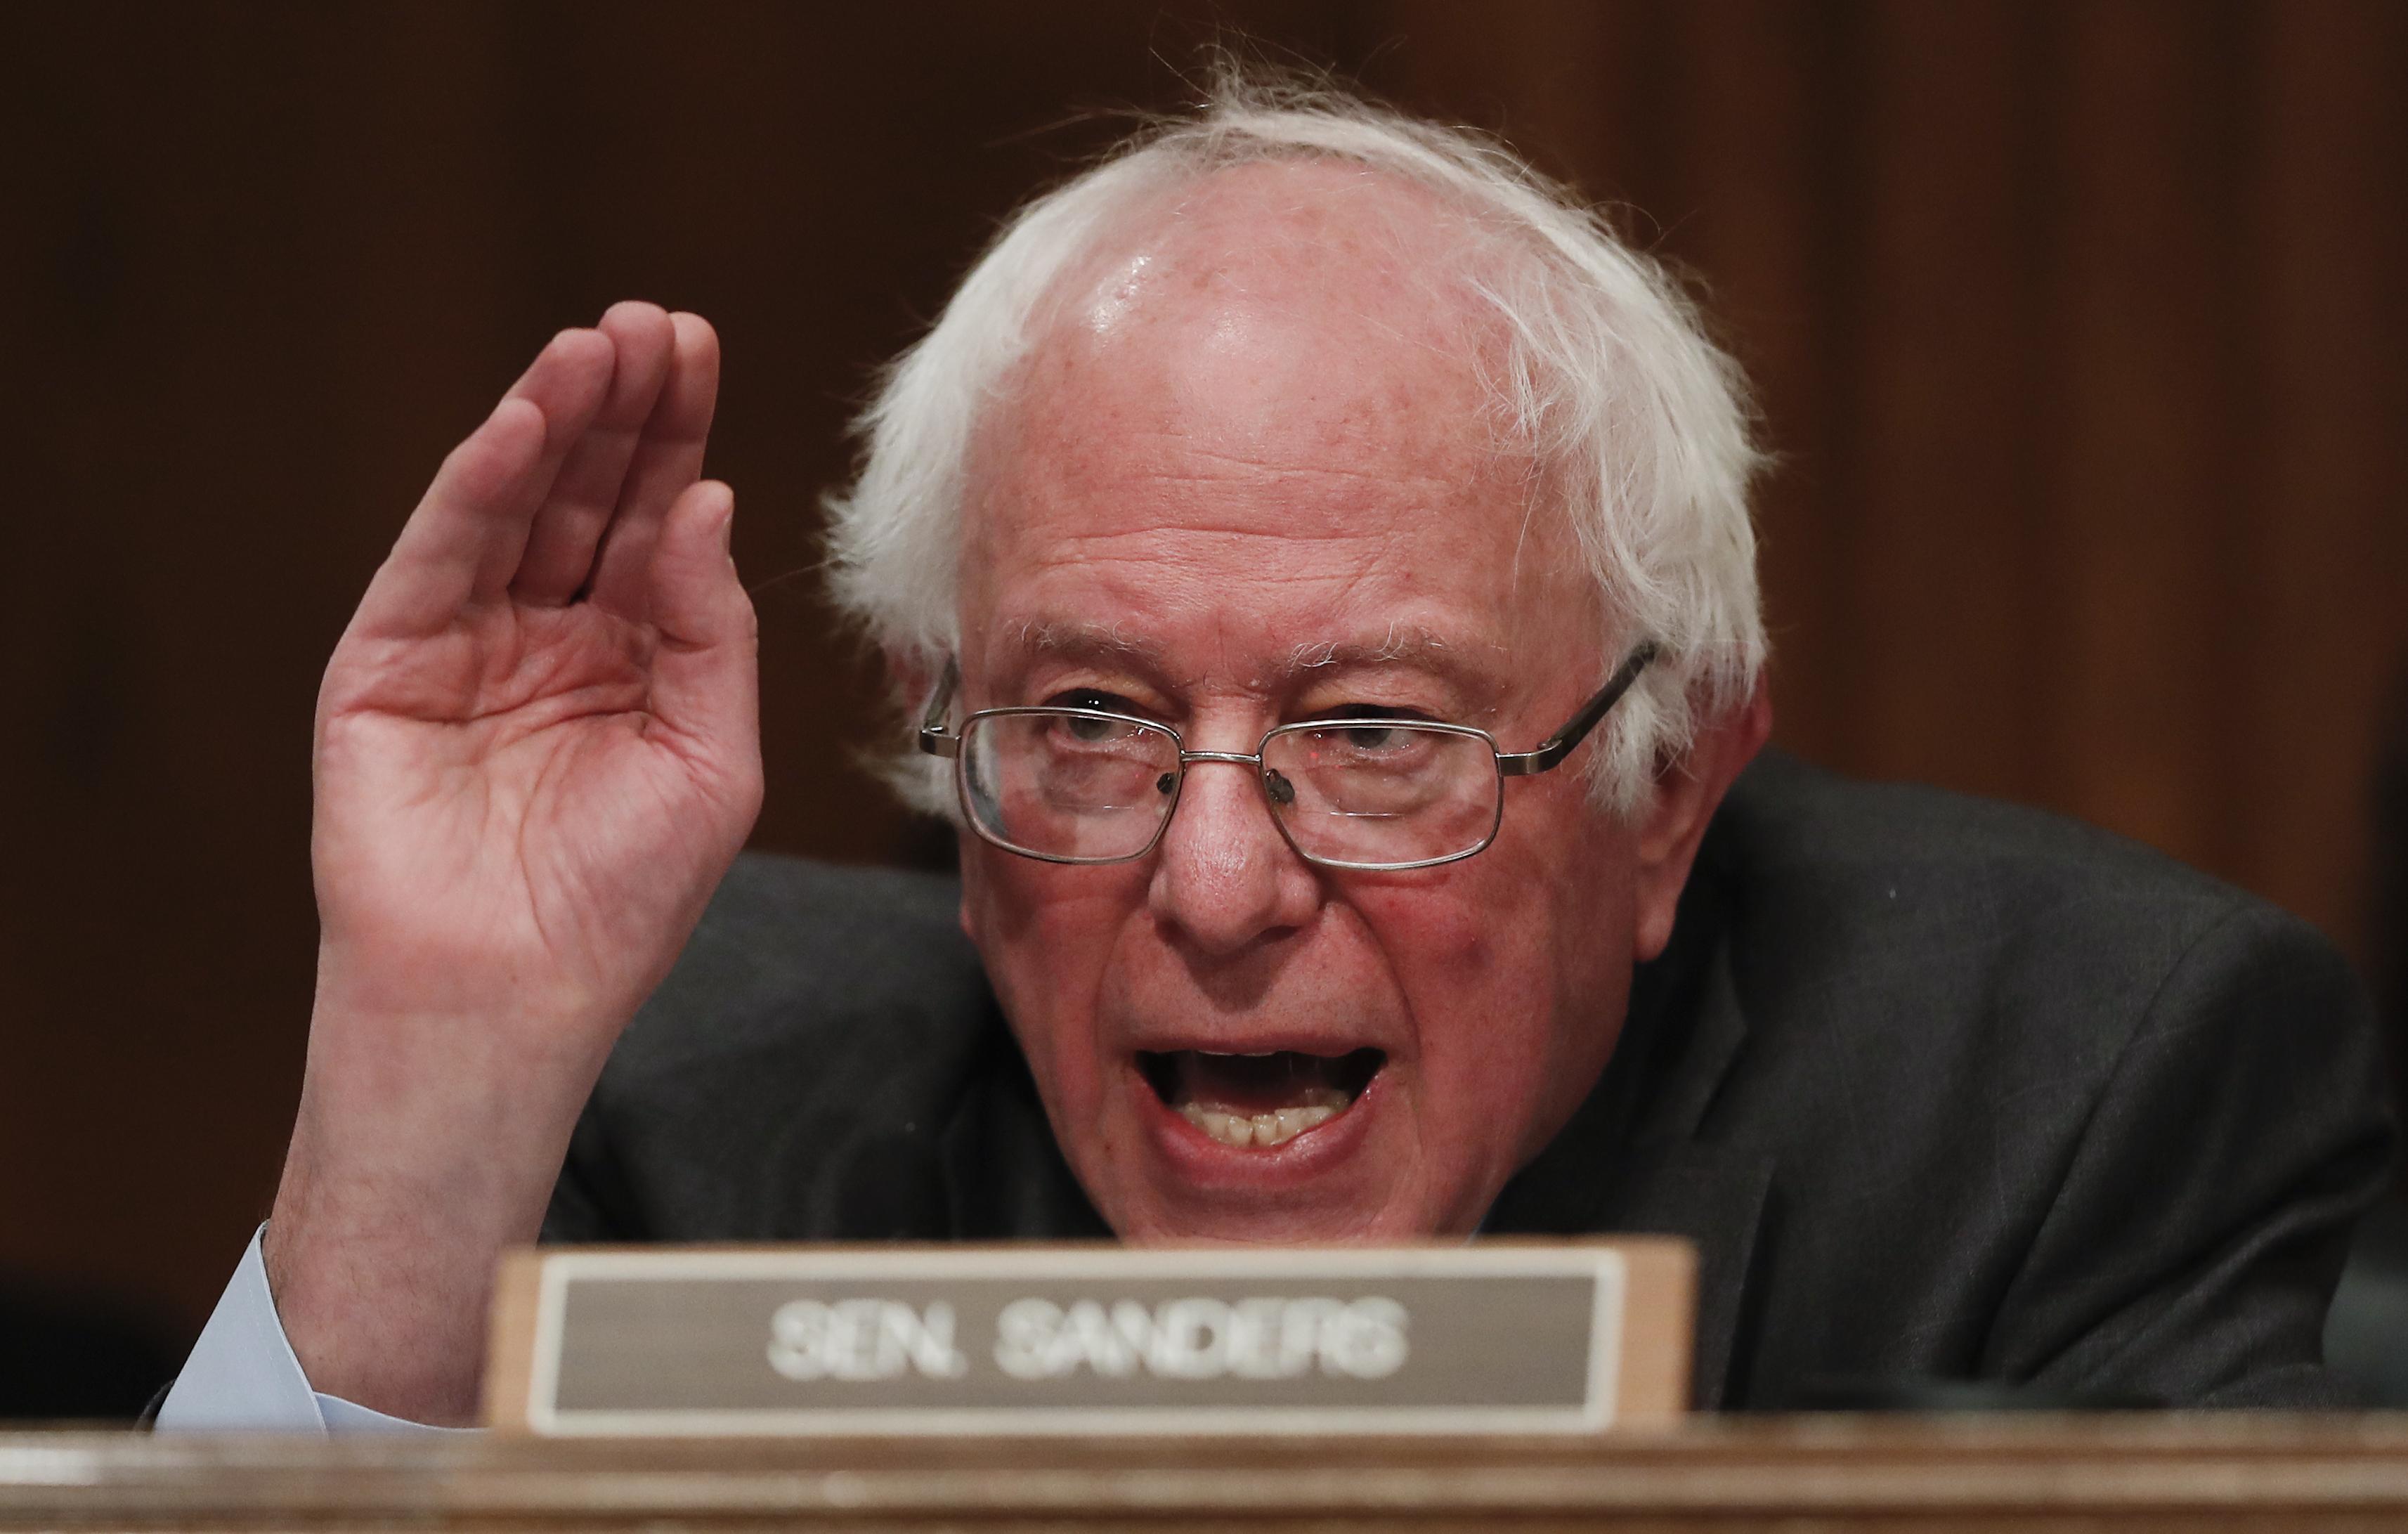 Senate Environment and Public Works Committee member Sen. Bernard Sanders, I-Vt. speaks on Capitol Hill in Washington on Jan. 18, 2017. (AP Photo/Carolyn Kaster)